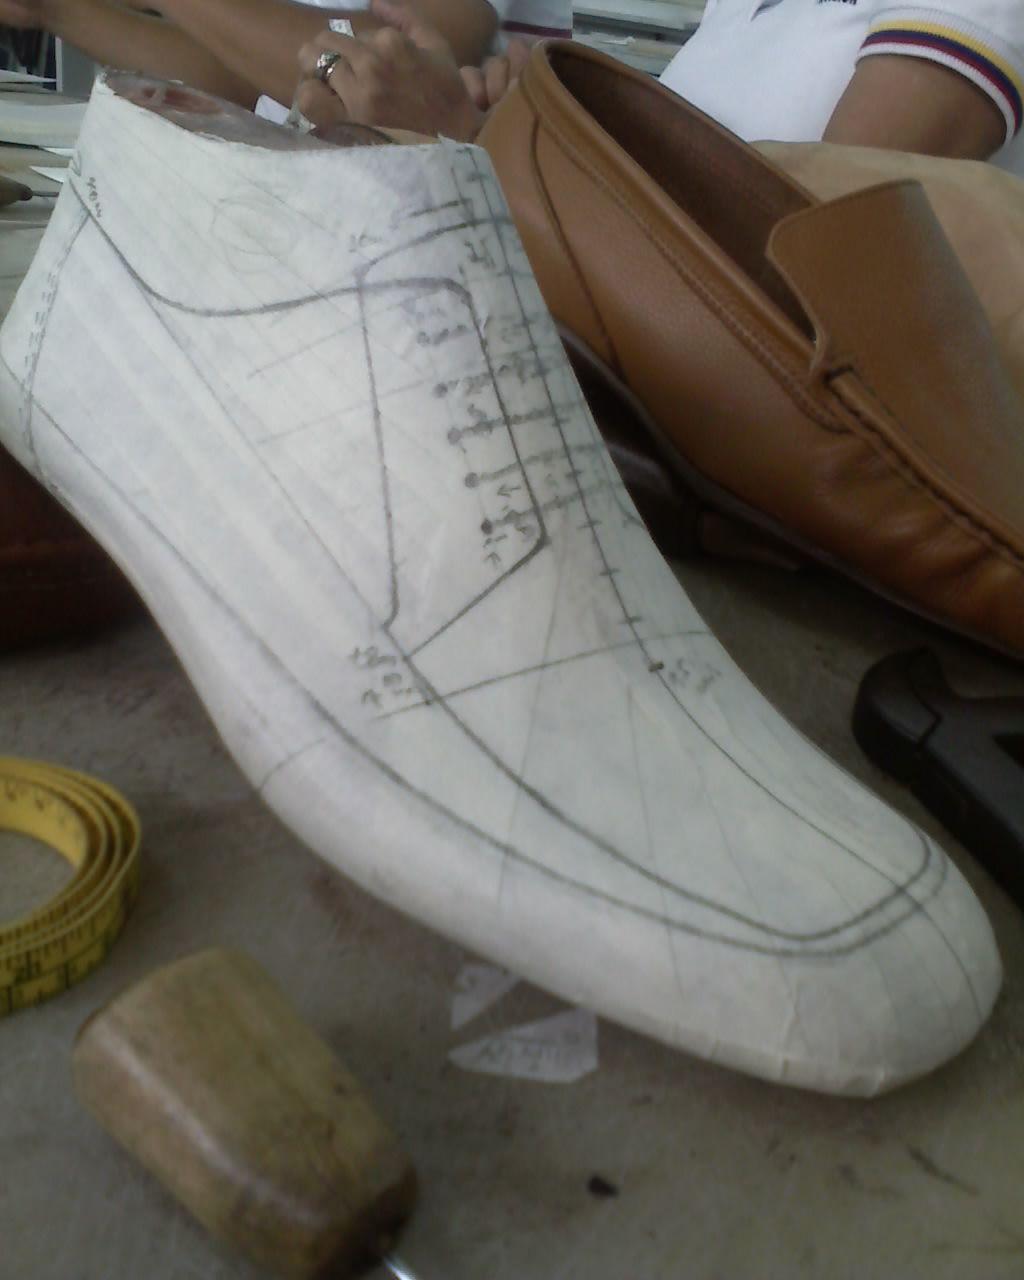 d8747d95 Diseño y modelaje de Calzado | shoes 100 | Zapatos de moda, Calzas ...